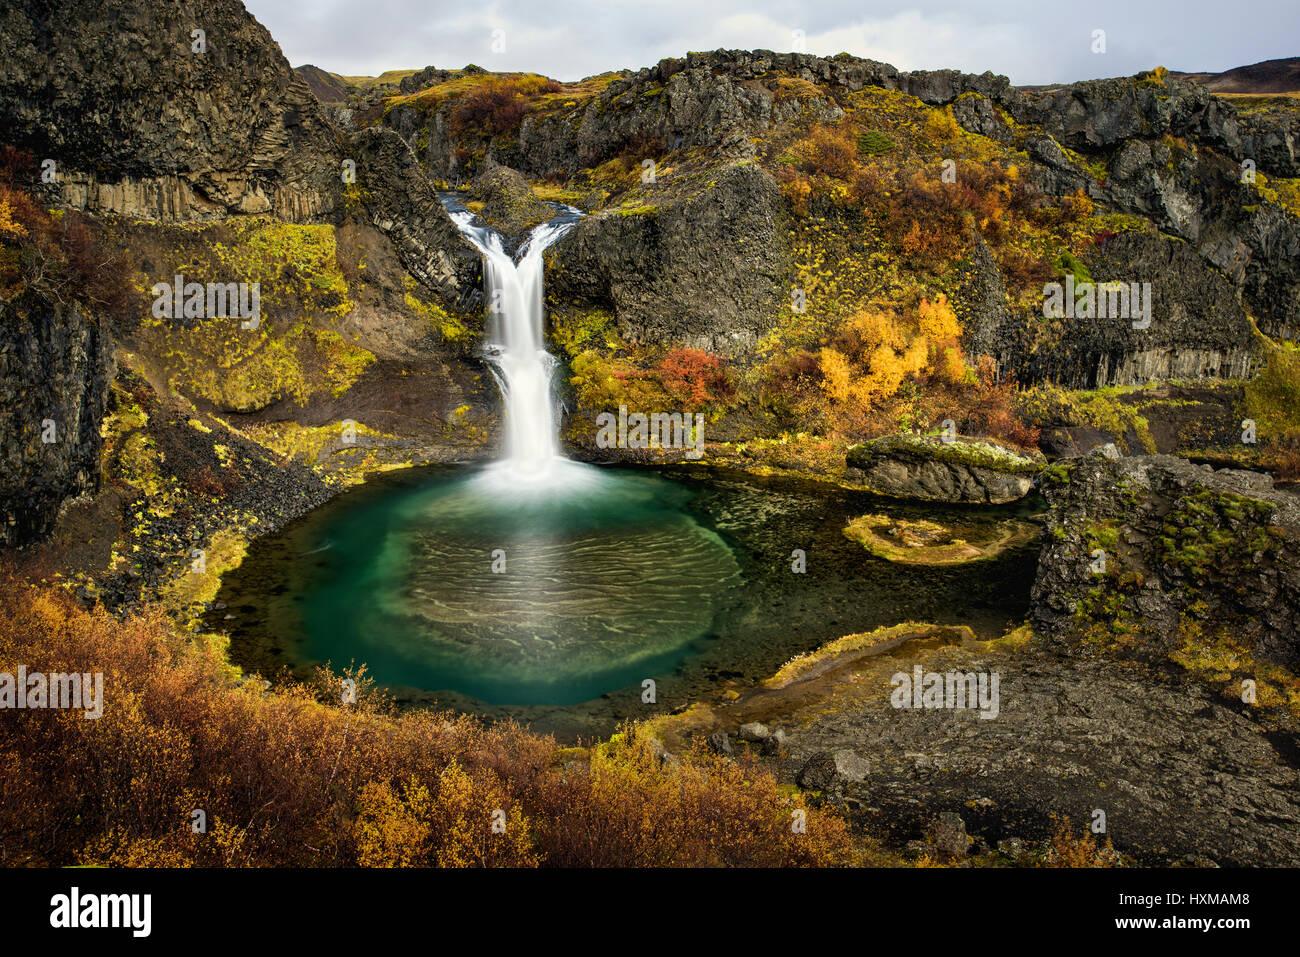 Gjainfoss Wasserfall Und Pool Im Herbst Island Stockfoto Bild